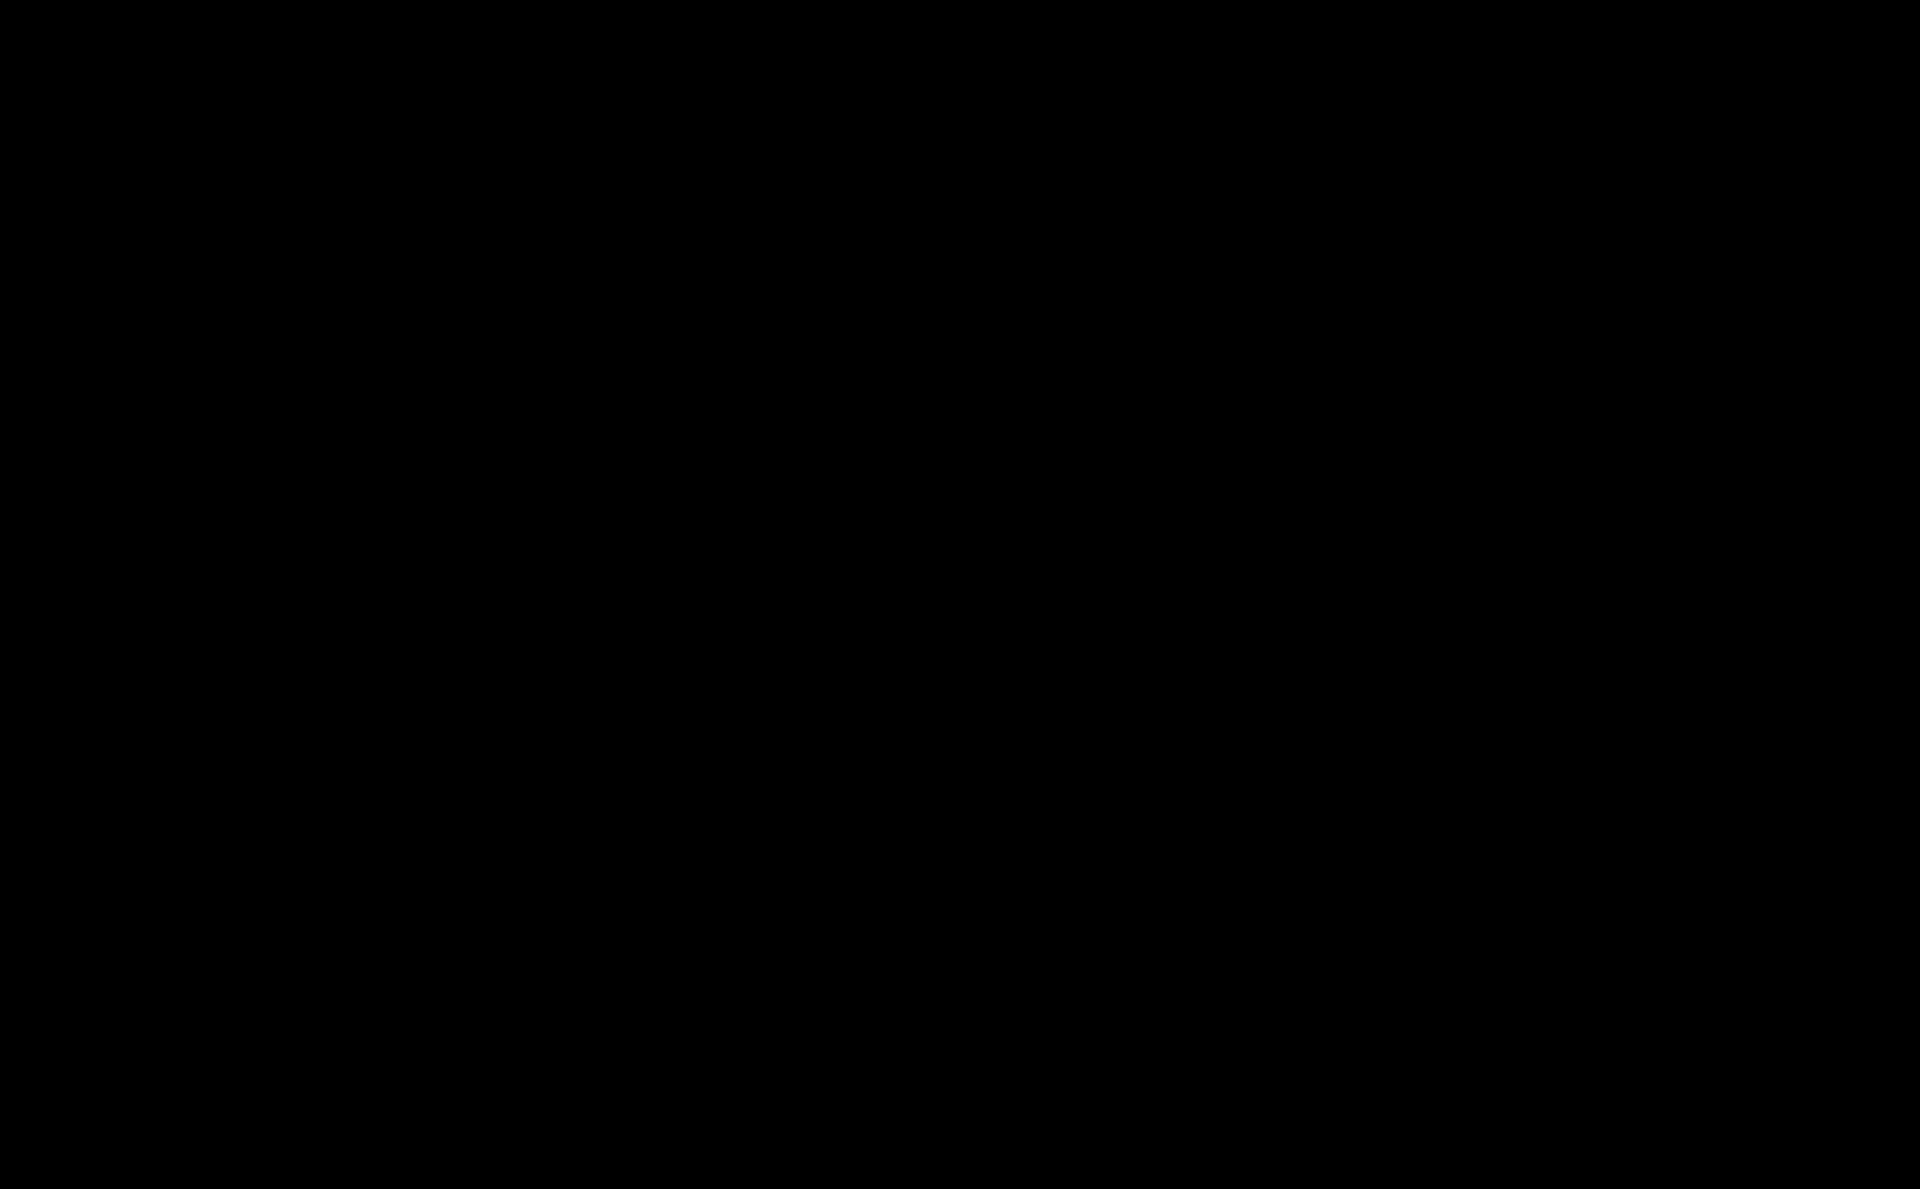 S_0001